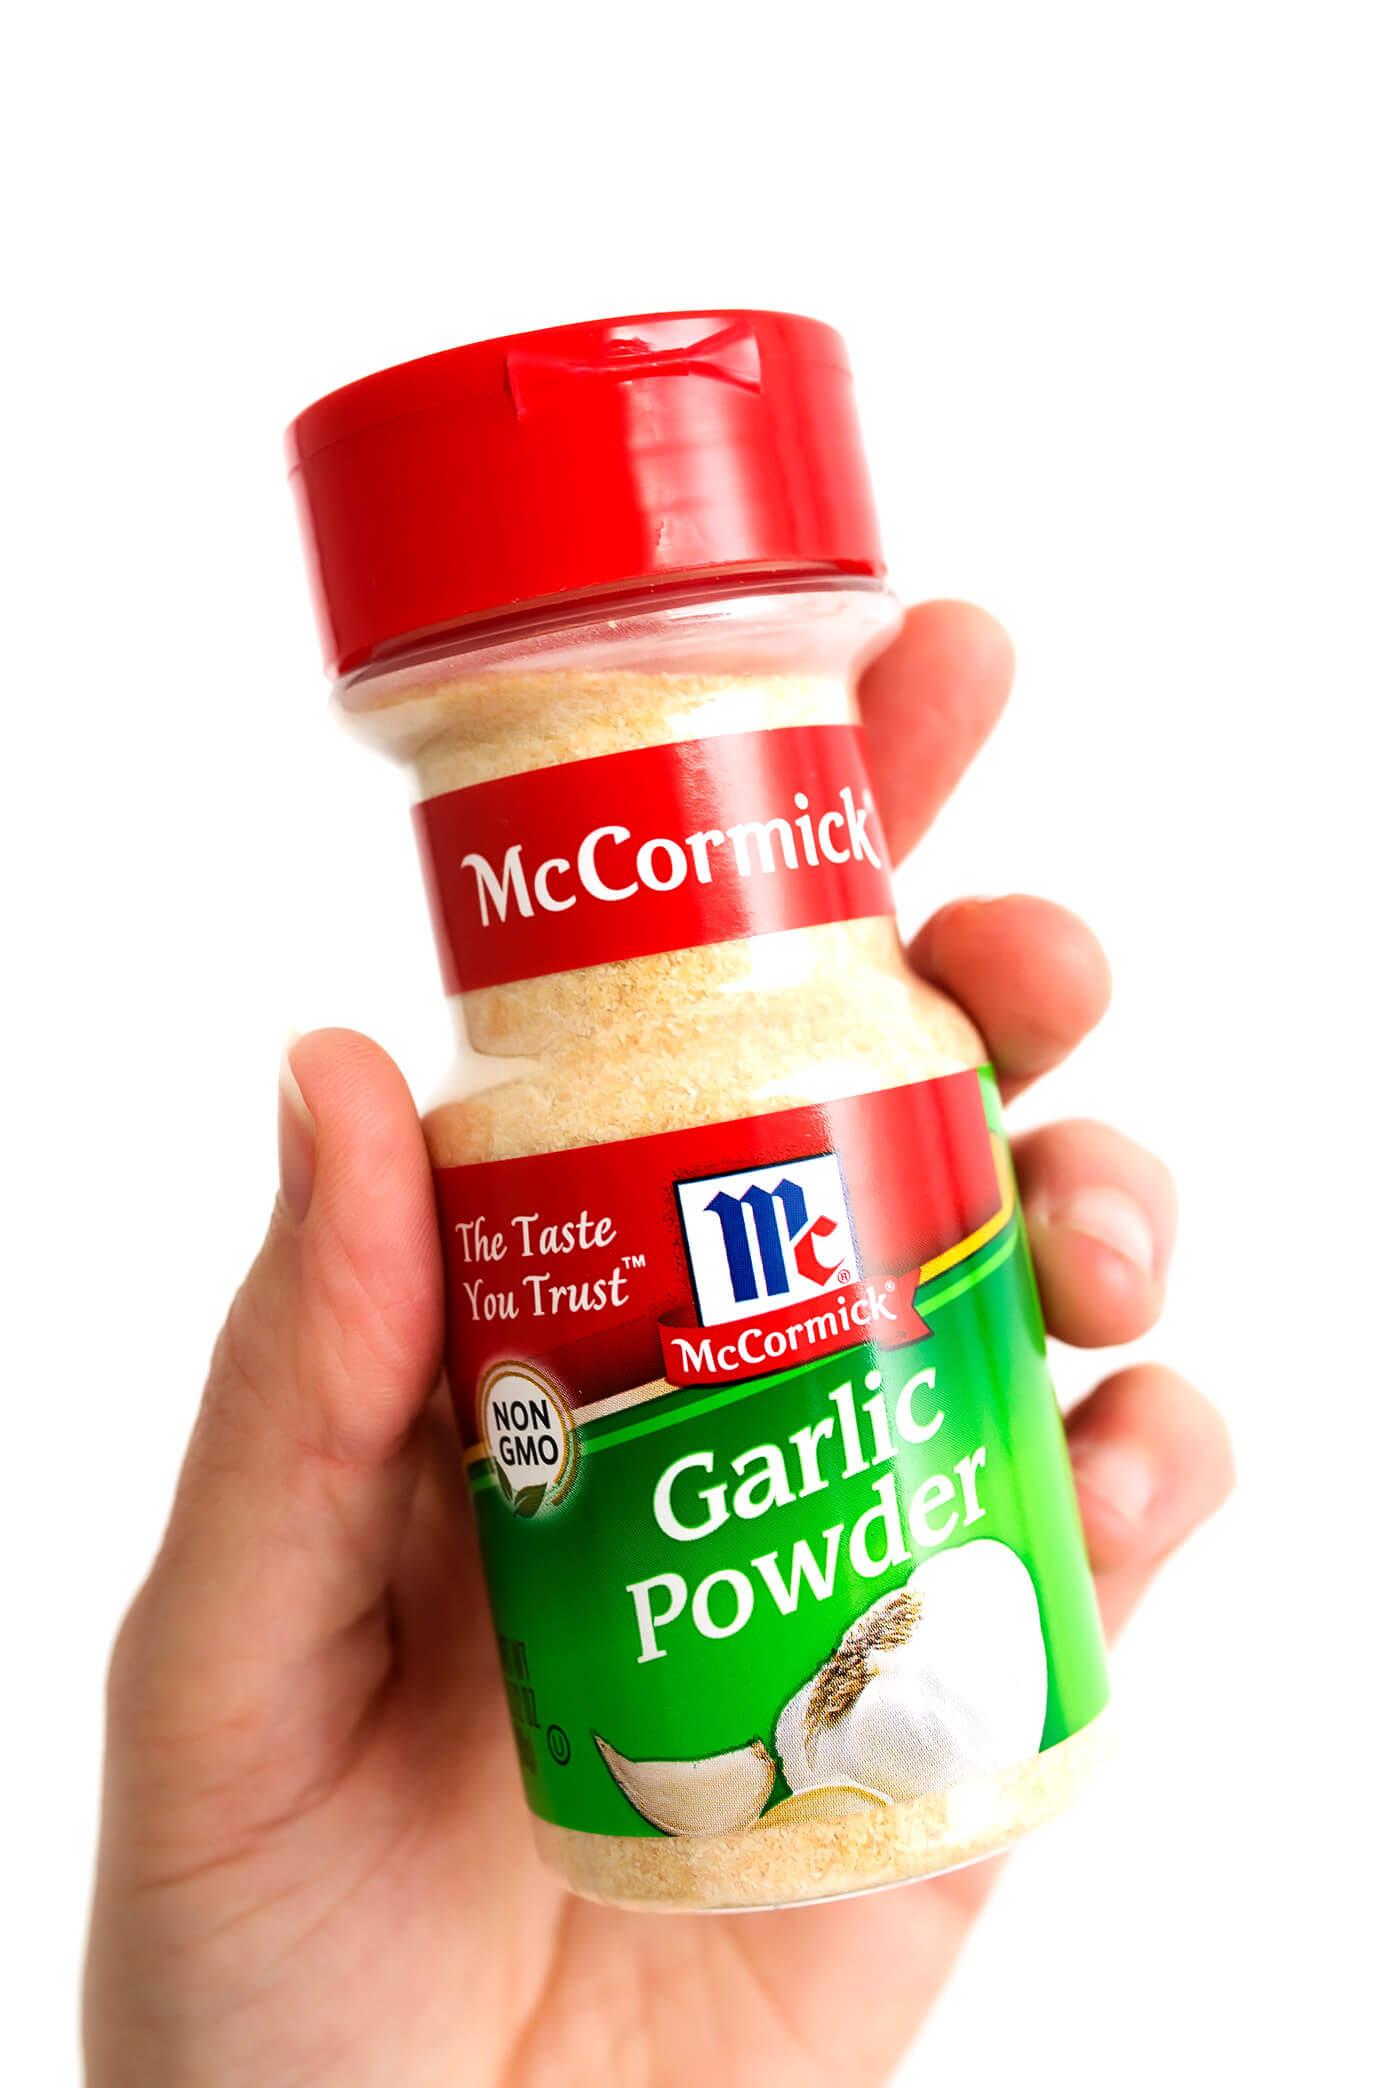 McCormick Garlic Powder | Extra Crispy Roasted Potatoes Recipe